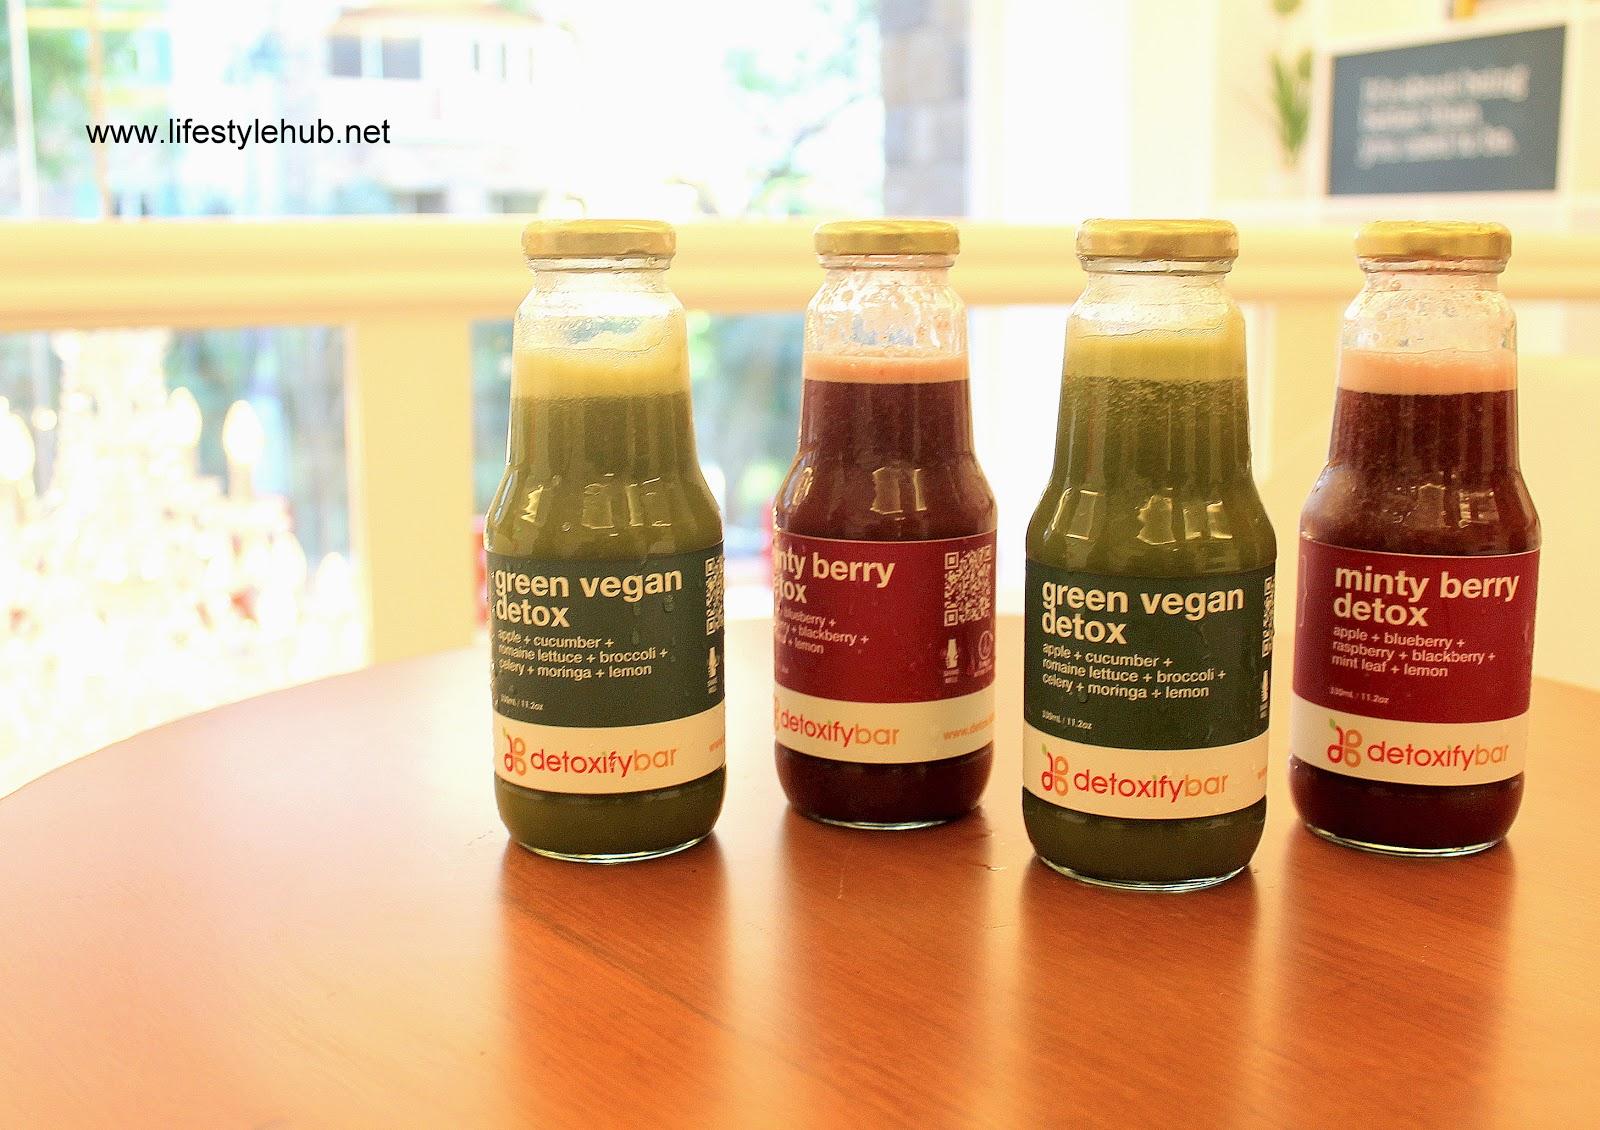 detoxify bar juice detox